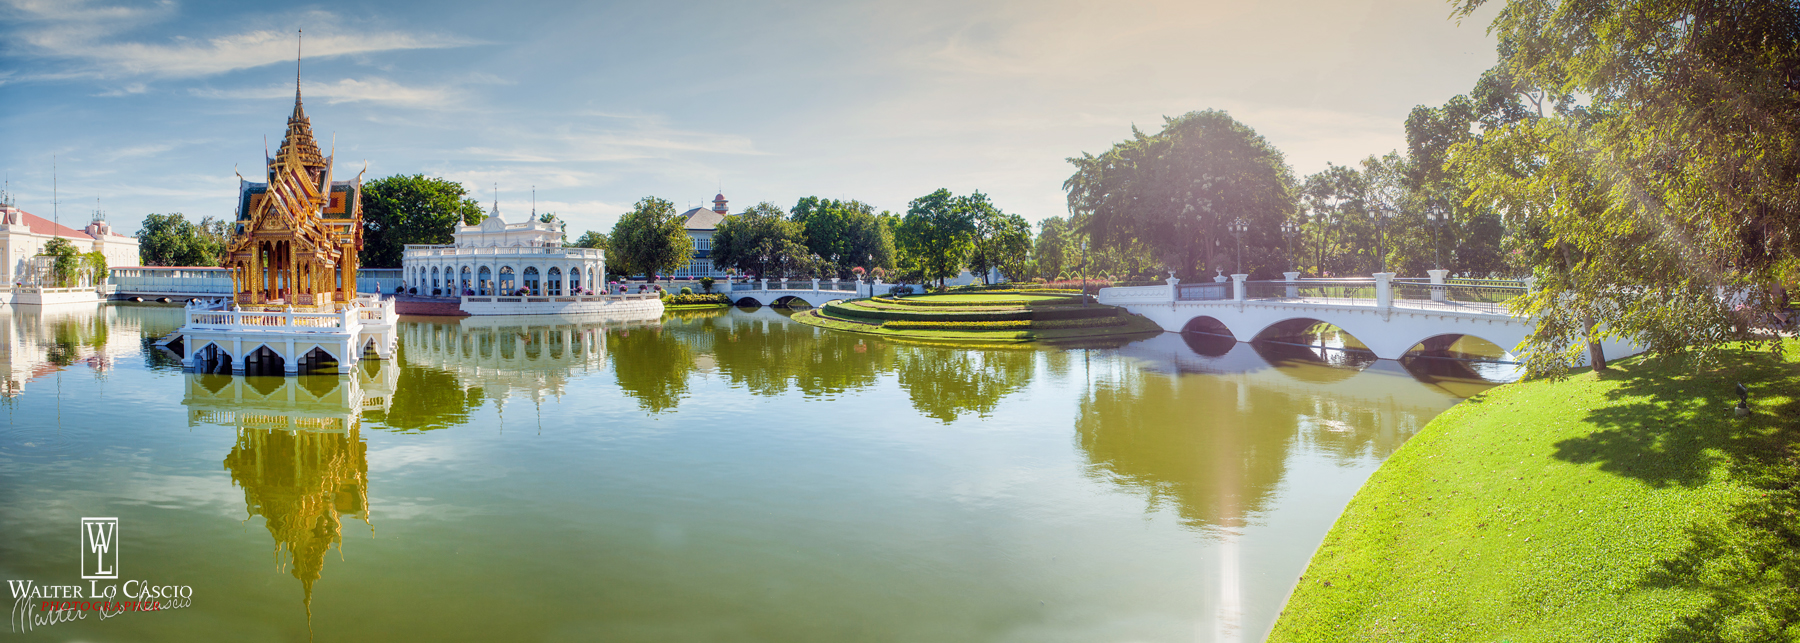 thailandia-2014_15327597946_o.jpg